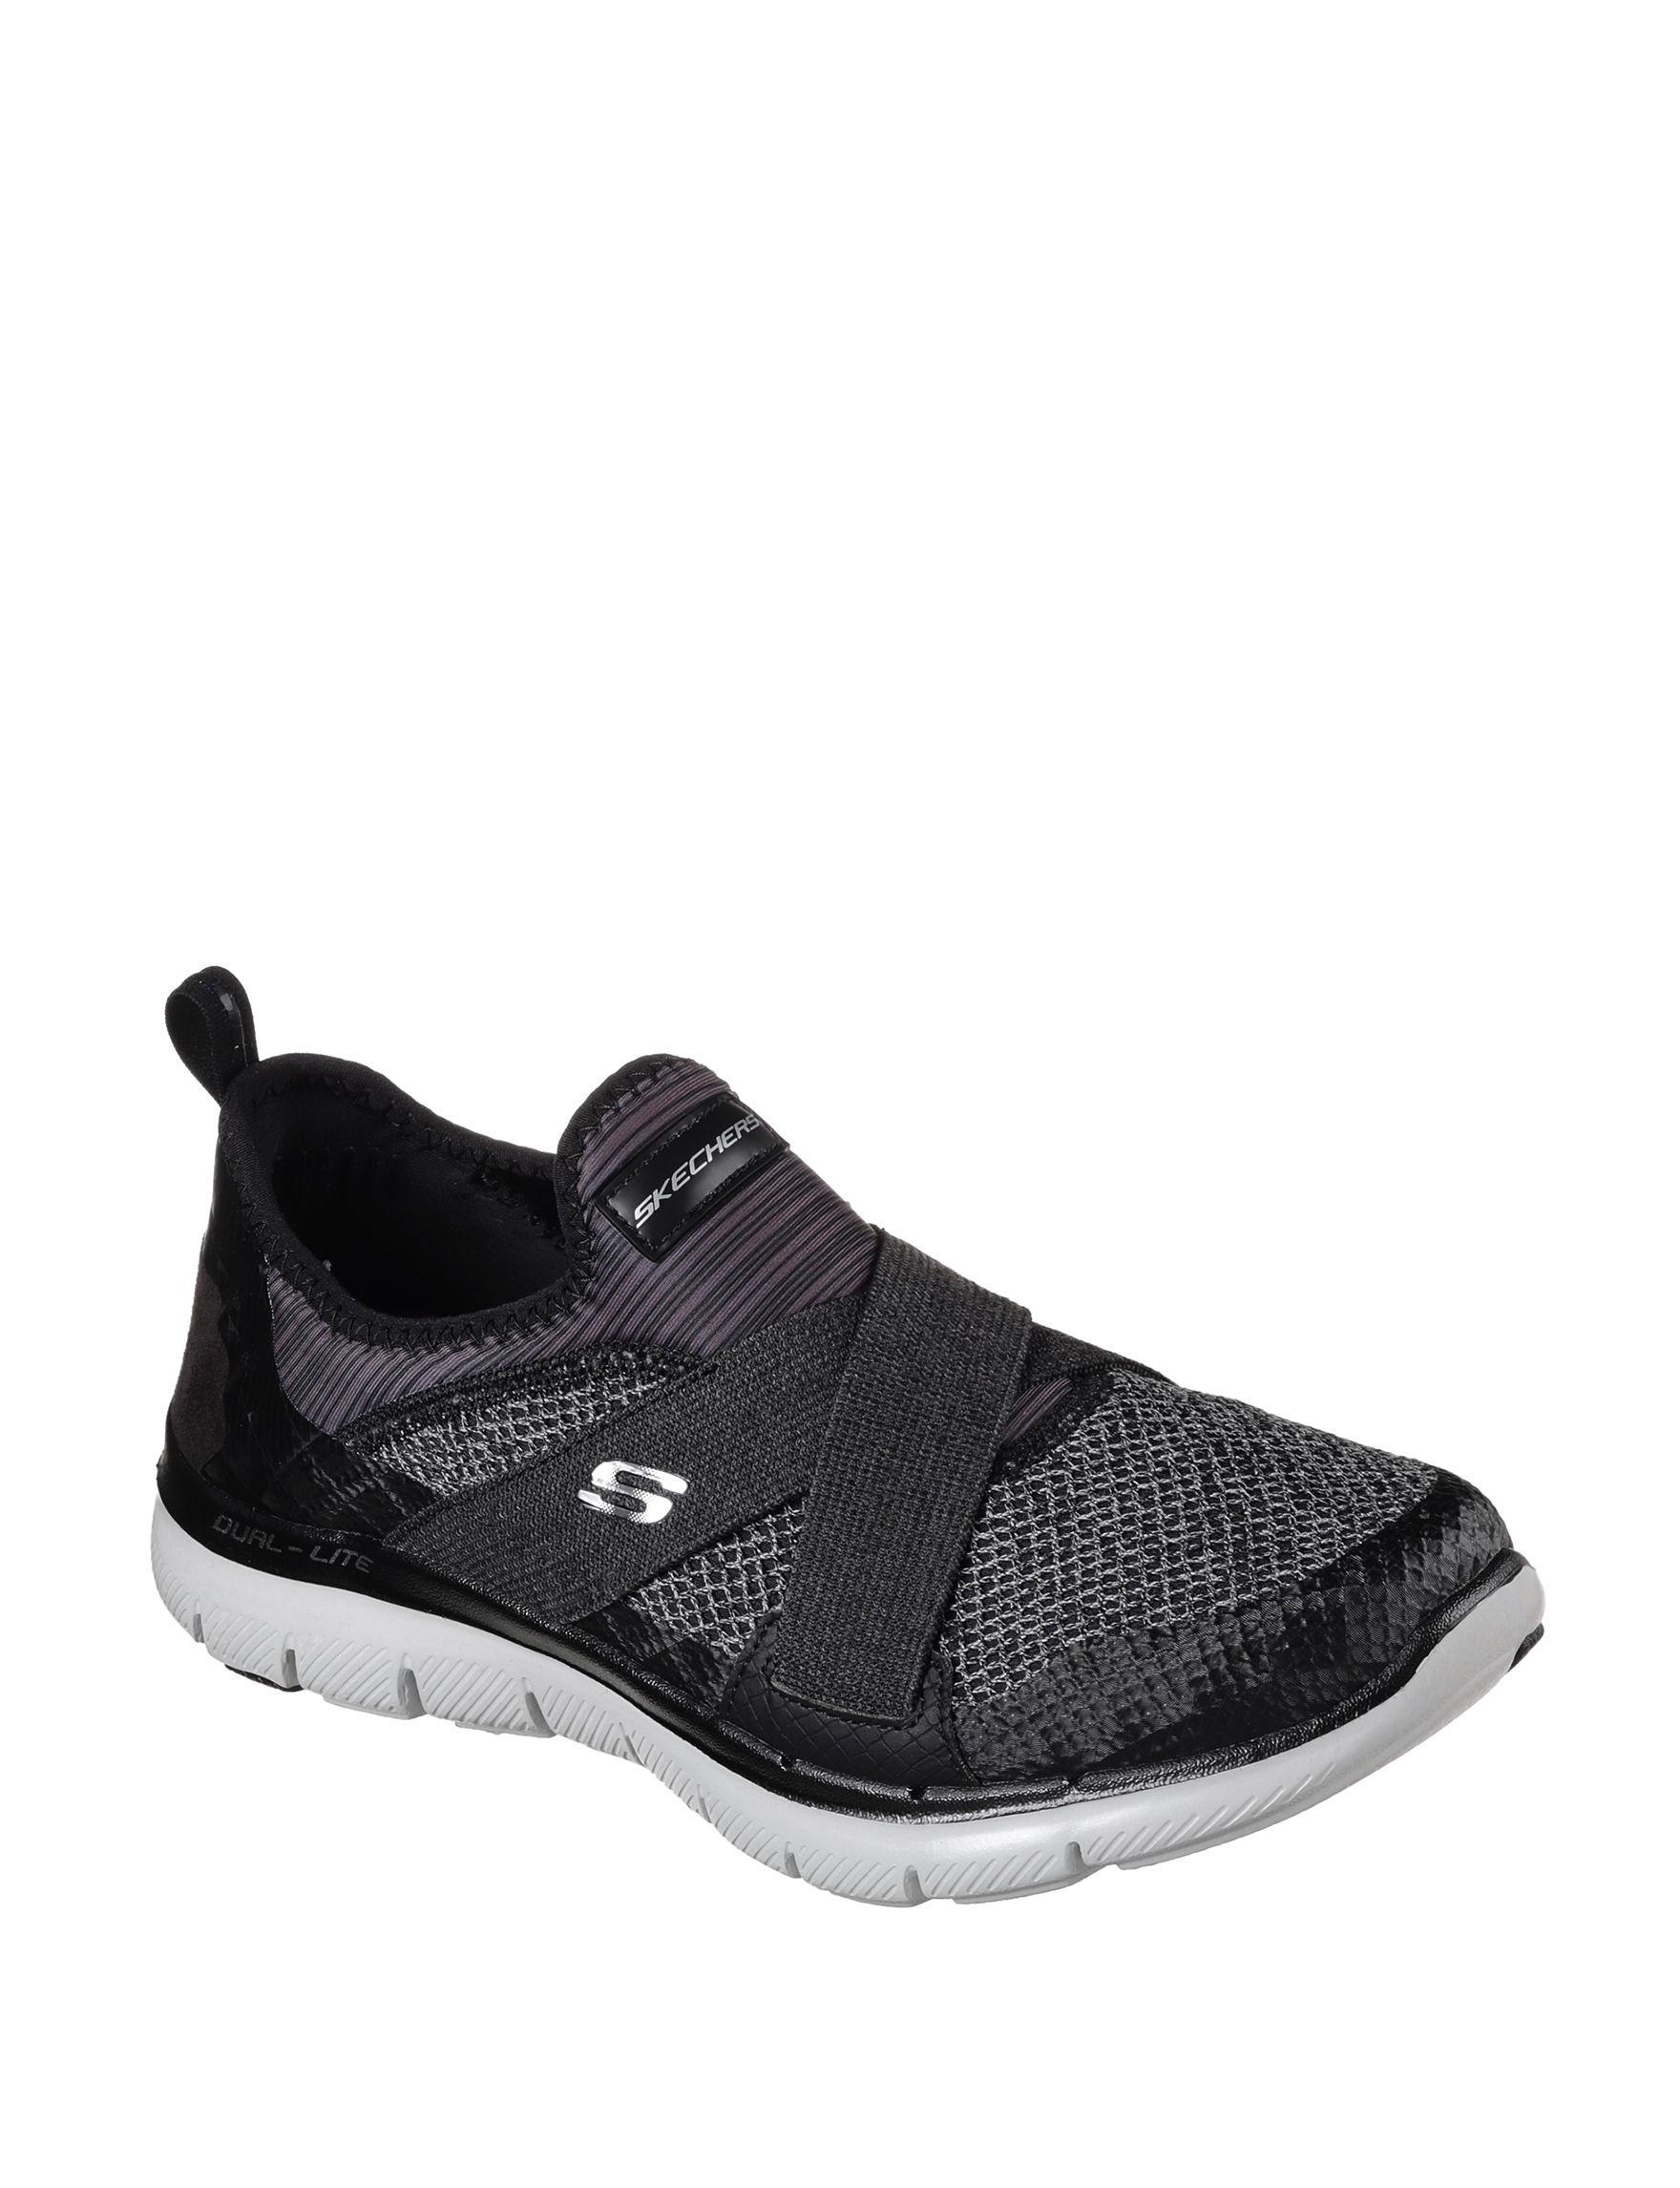 Skechers Black Comfort Stretch